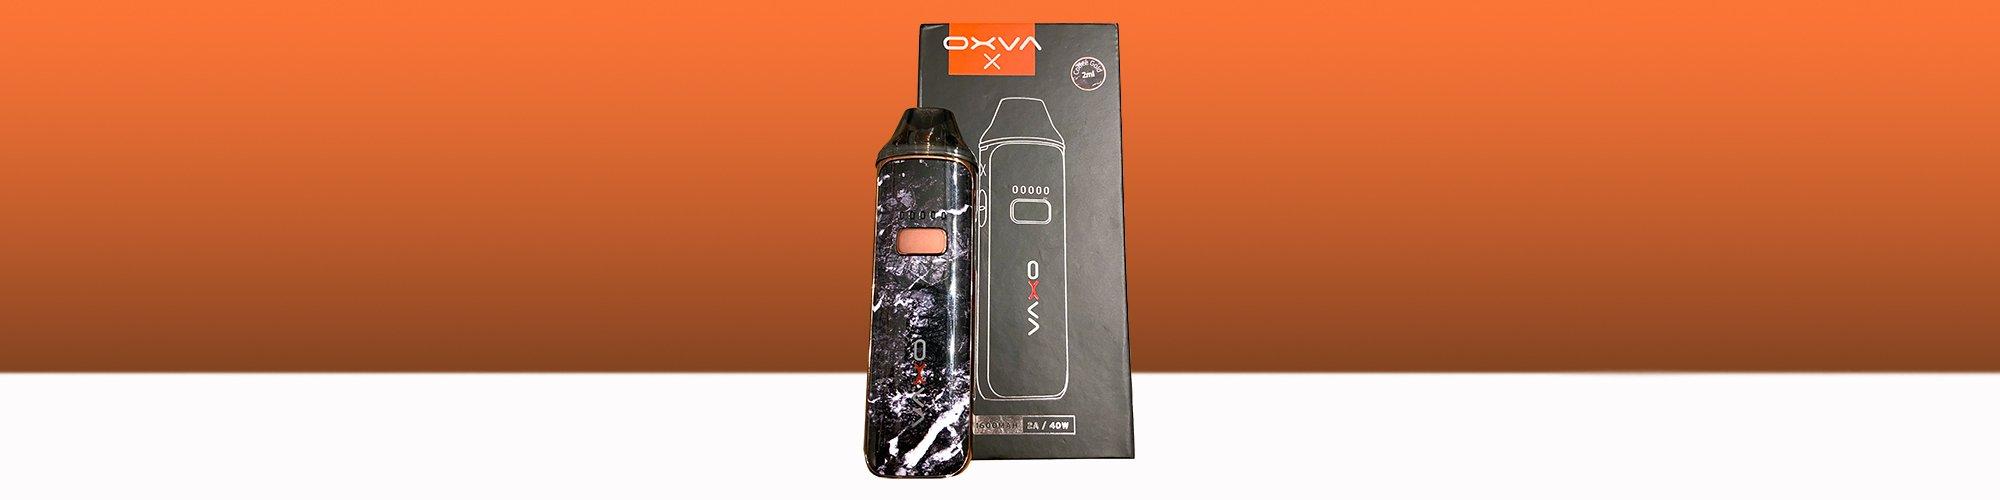 OXVA X Review Main Banner